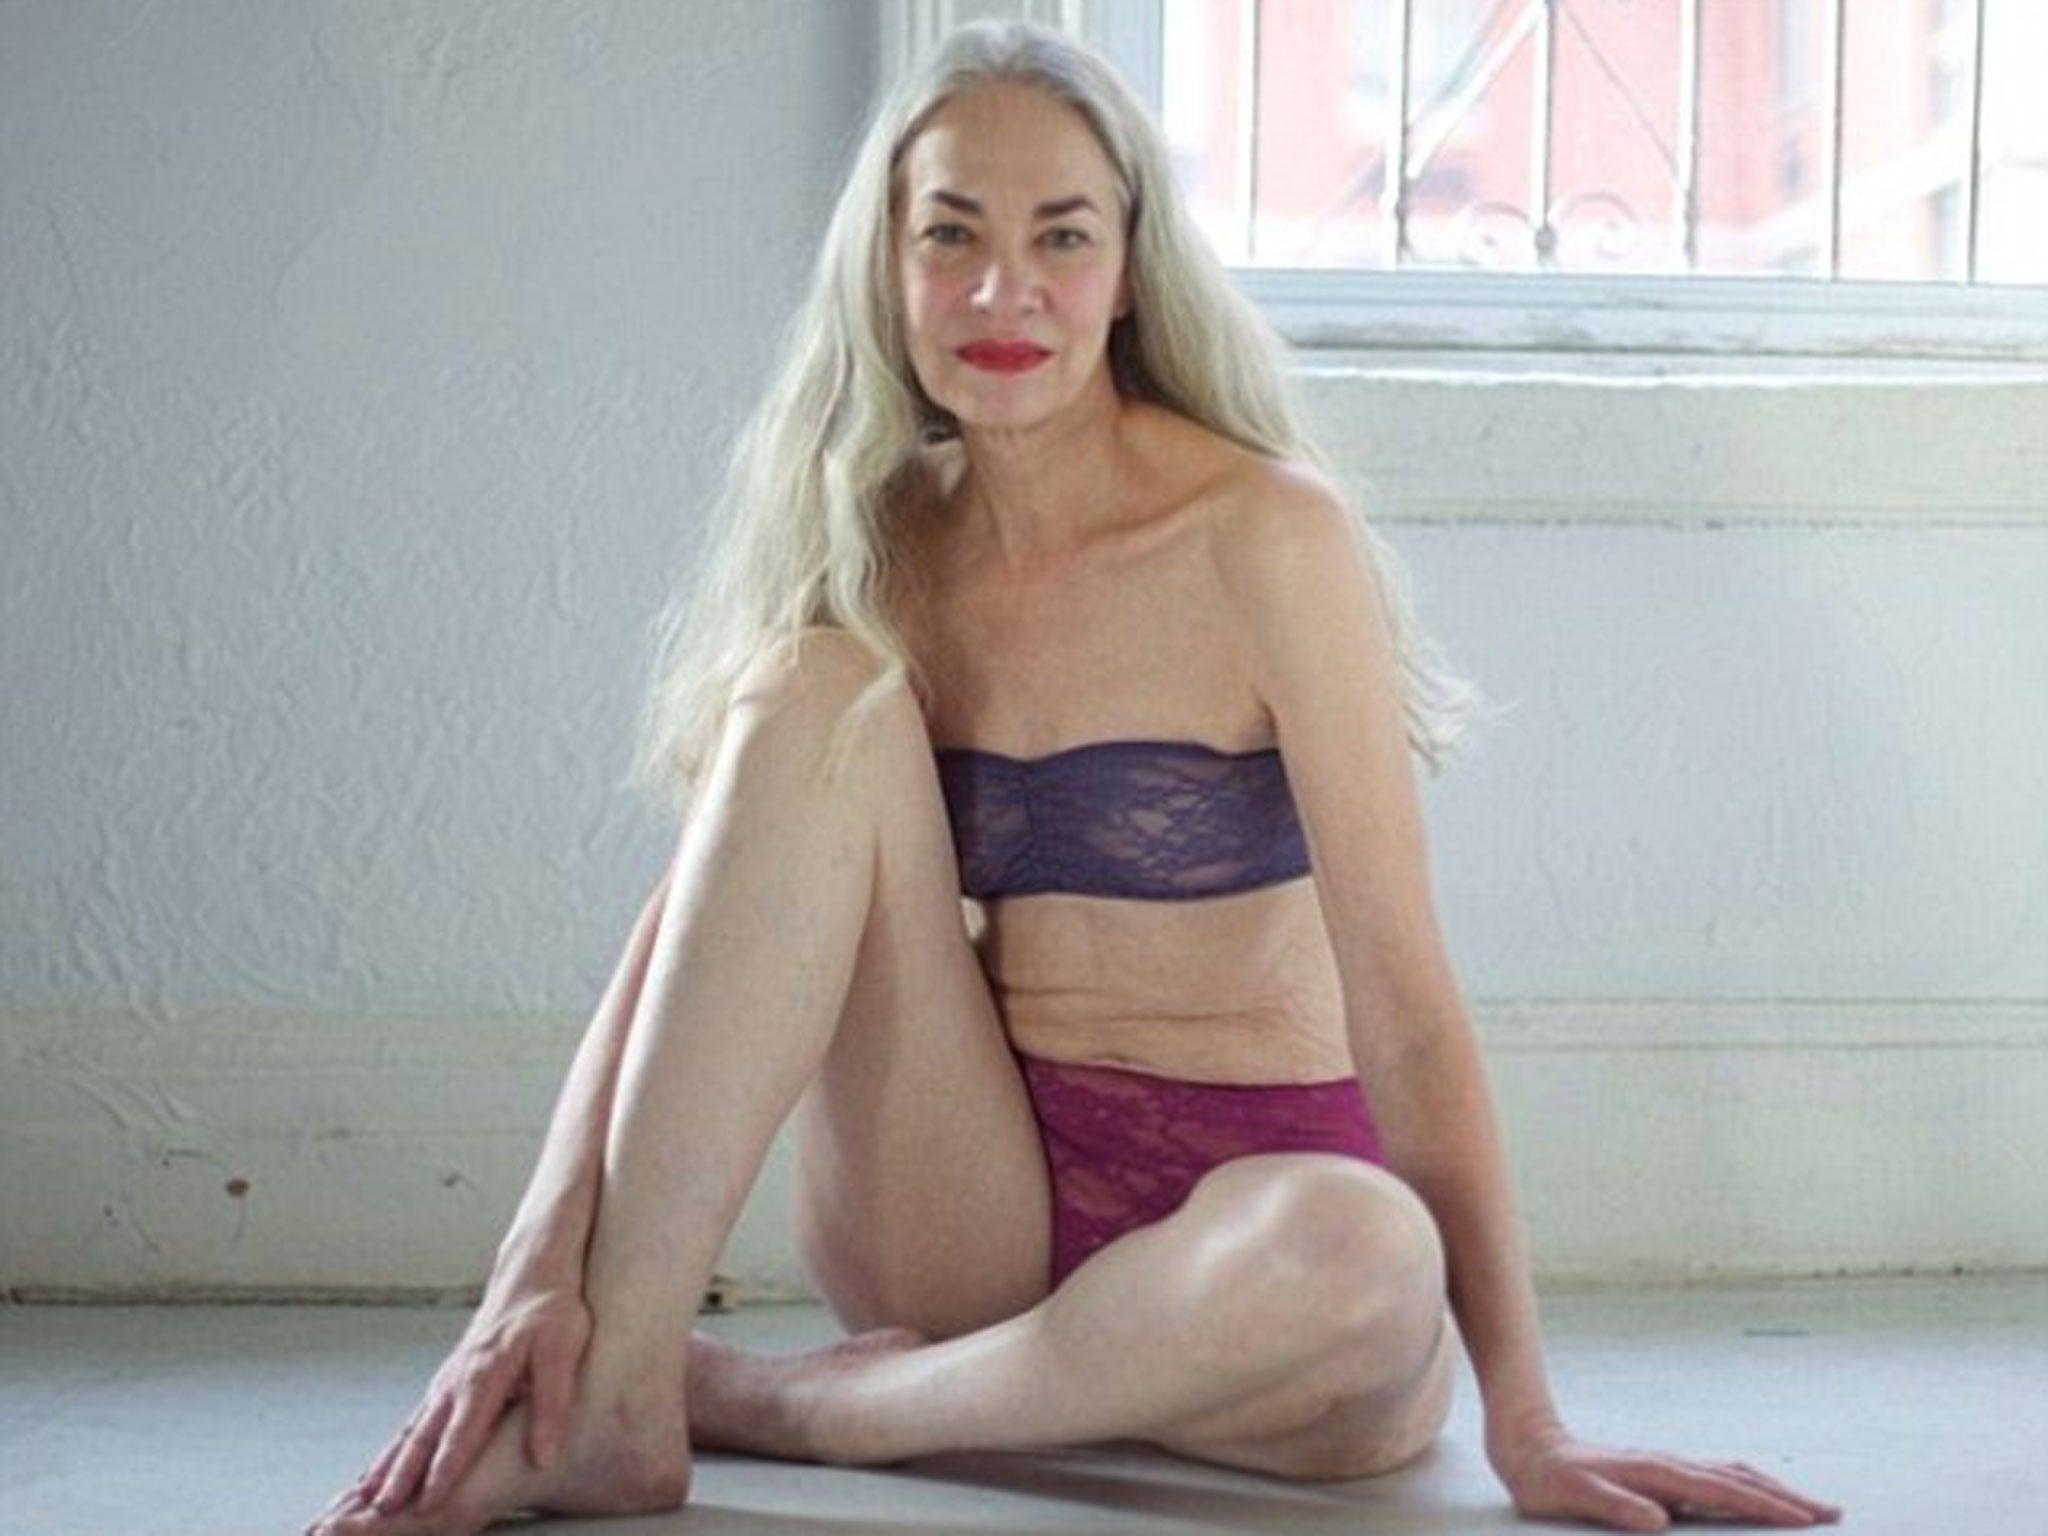 Лесбиянки ласкают большие груди - видео / likes @ My Hard